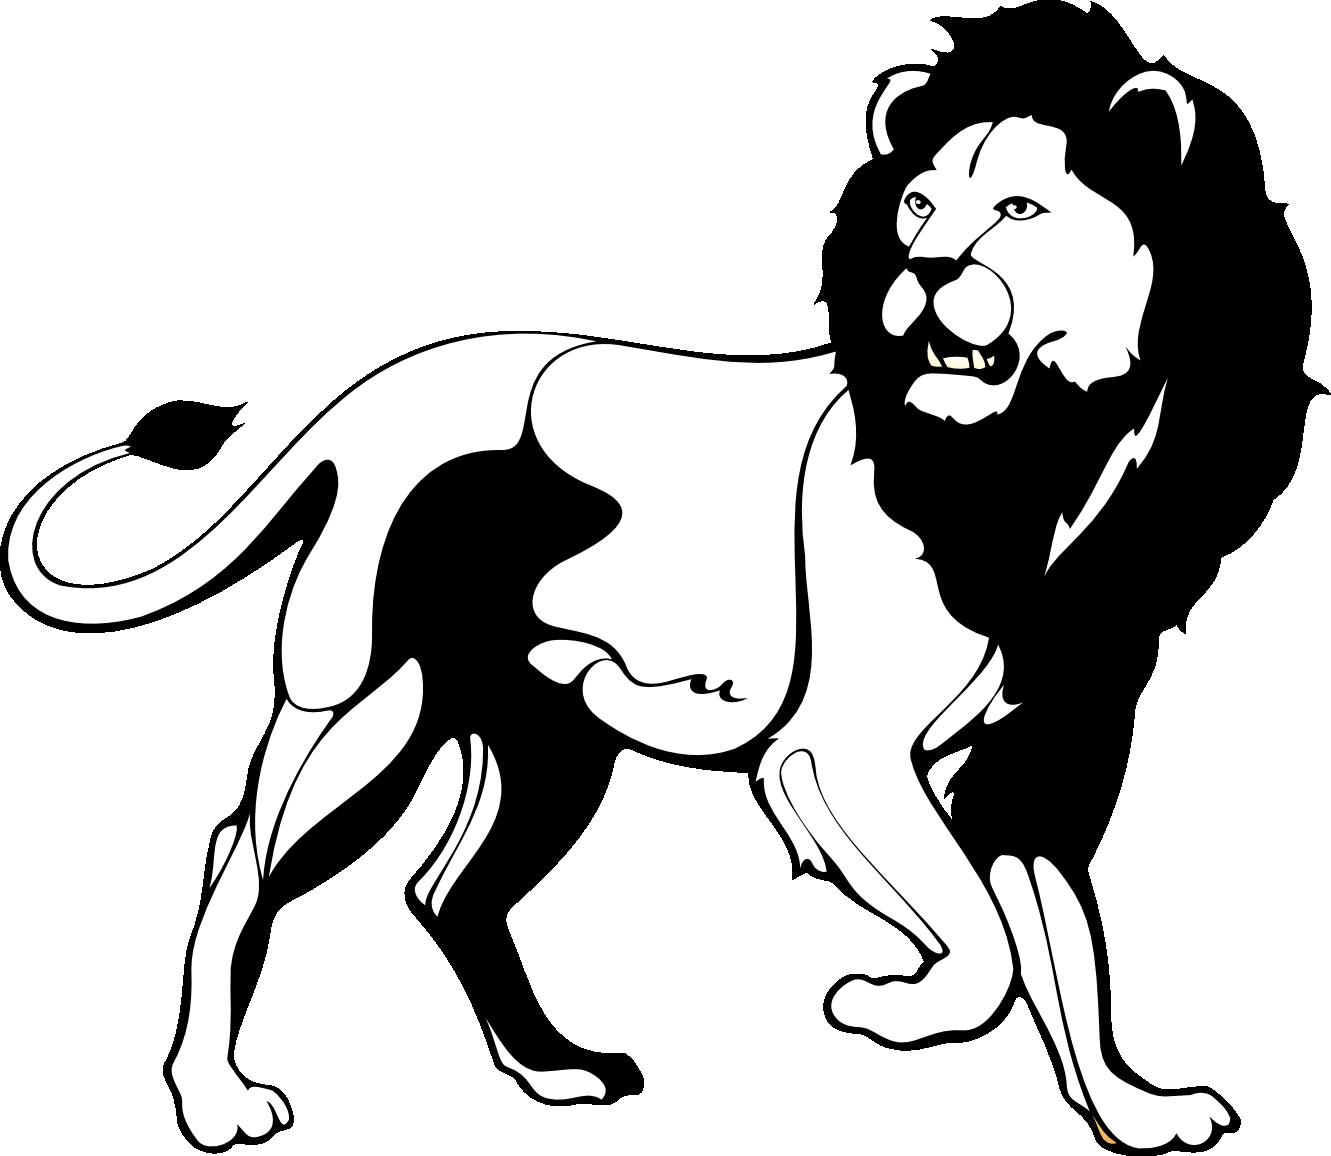 Warrior clipart lion. Free graphic download clip